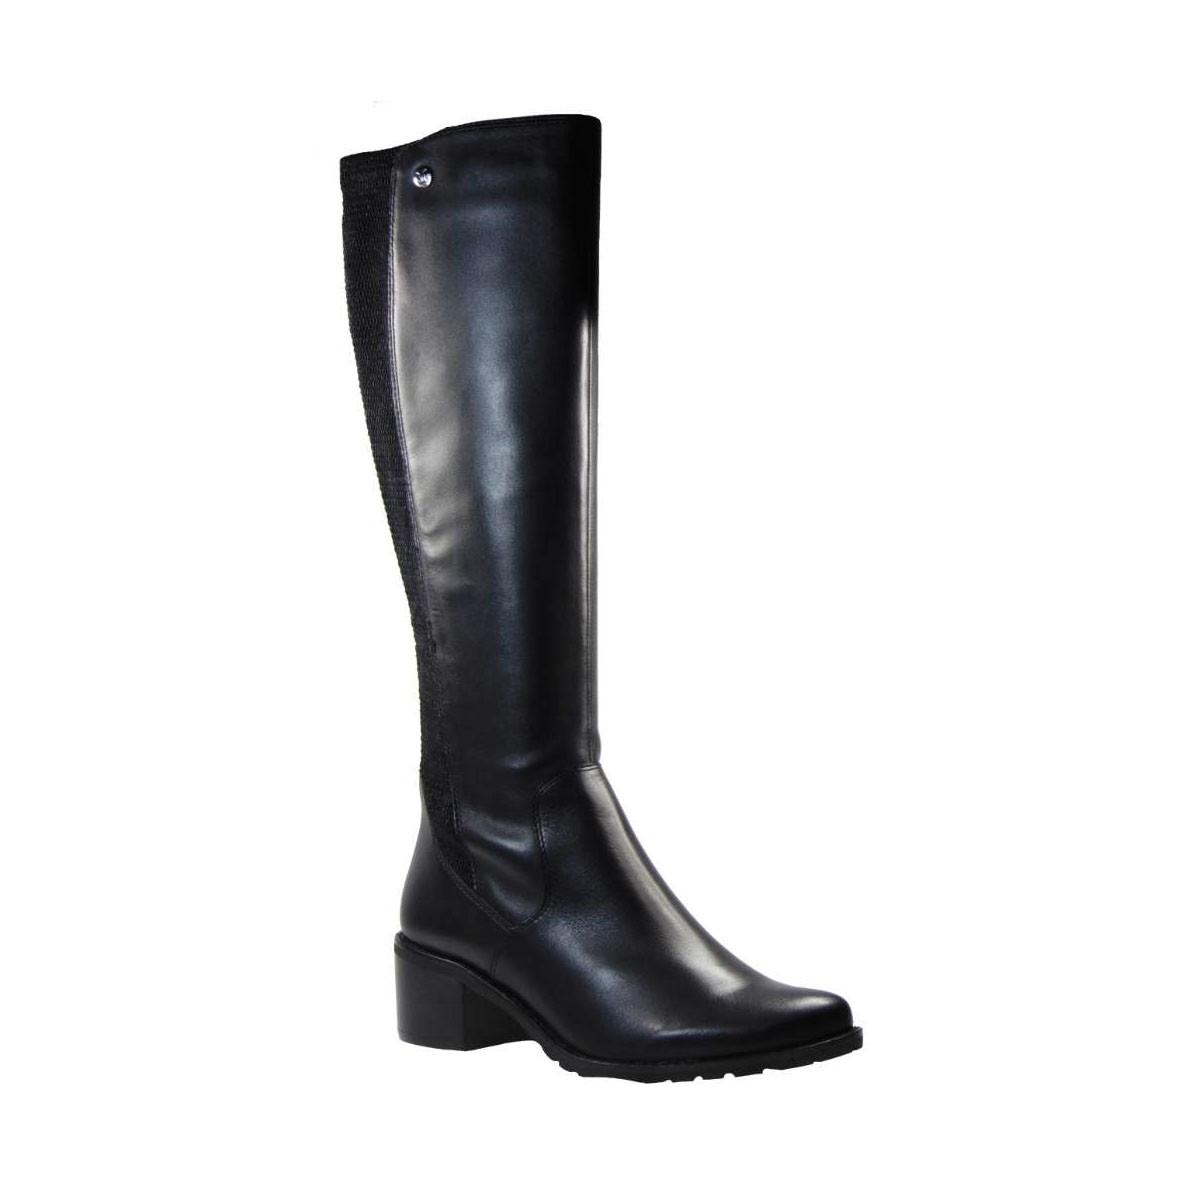 Caprice 9-9-25512-21-022 Ανατομική Μπότα Απο Γνήσιο Δέρμα Μαύρη